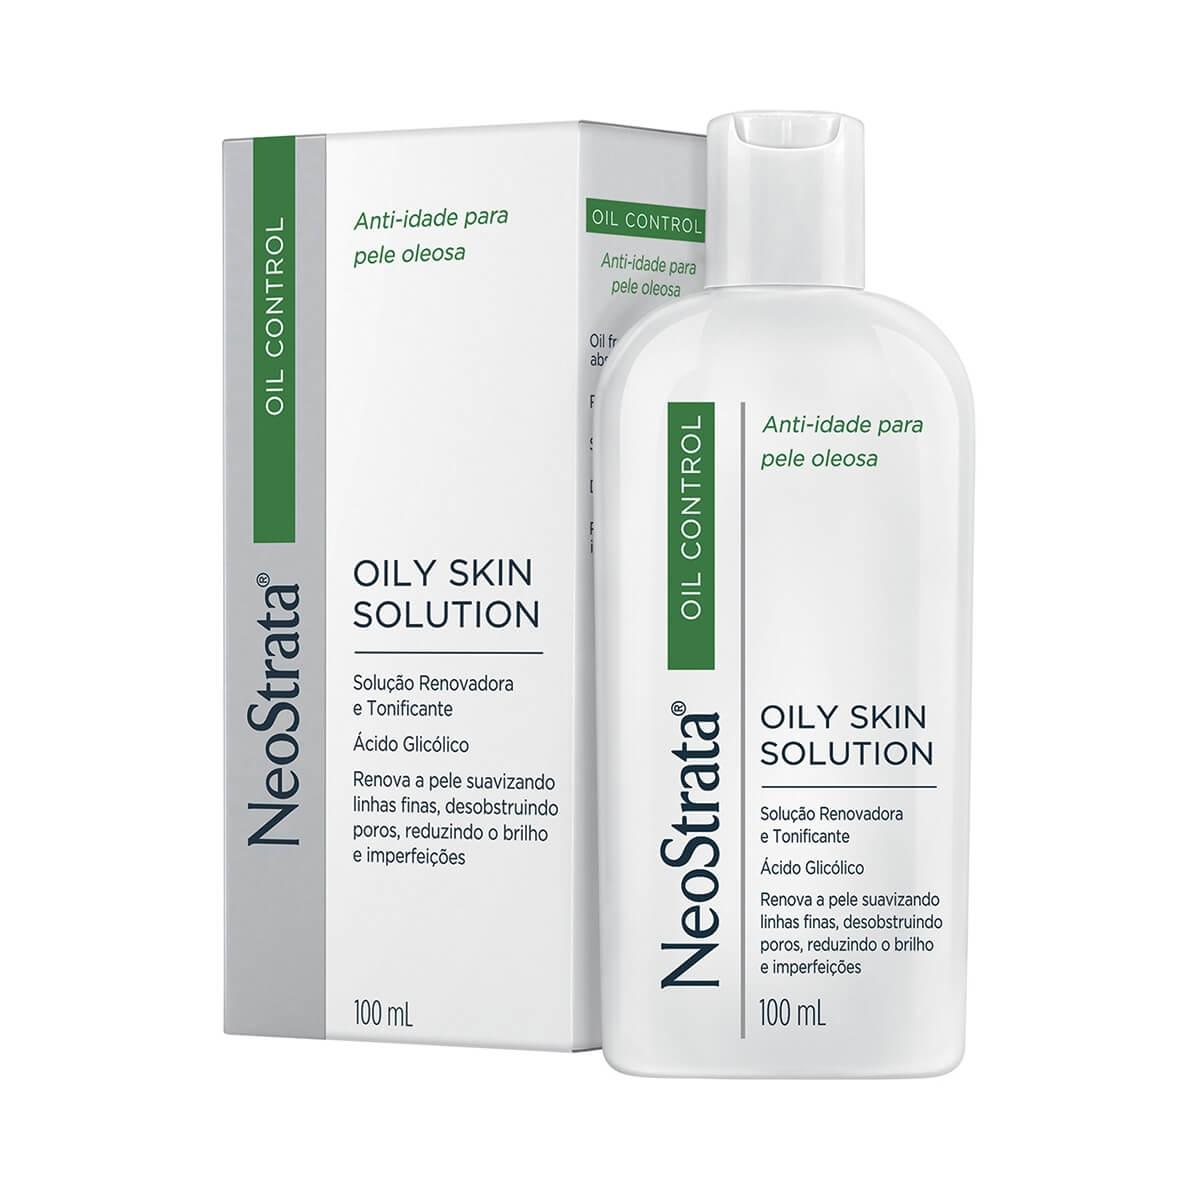 NeoStrata Oily Skin Solution Tônico Anti-idade com 100ml 100ml